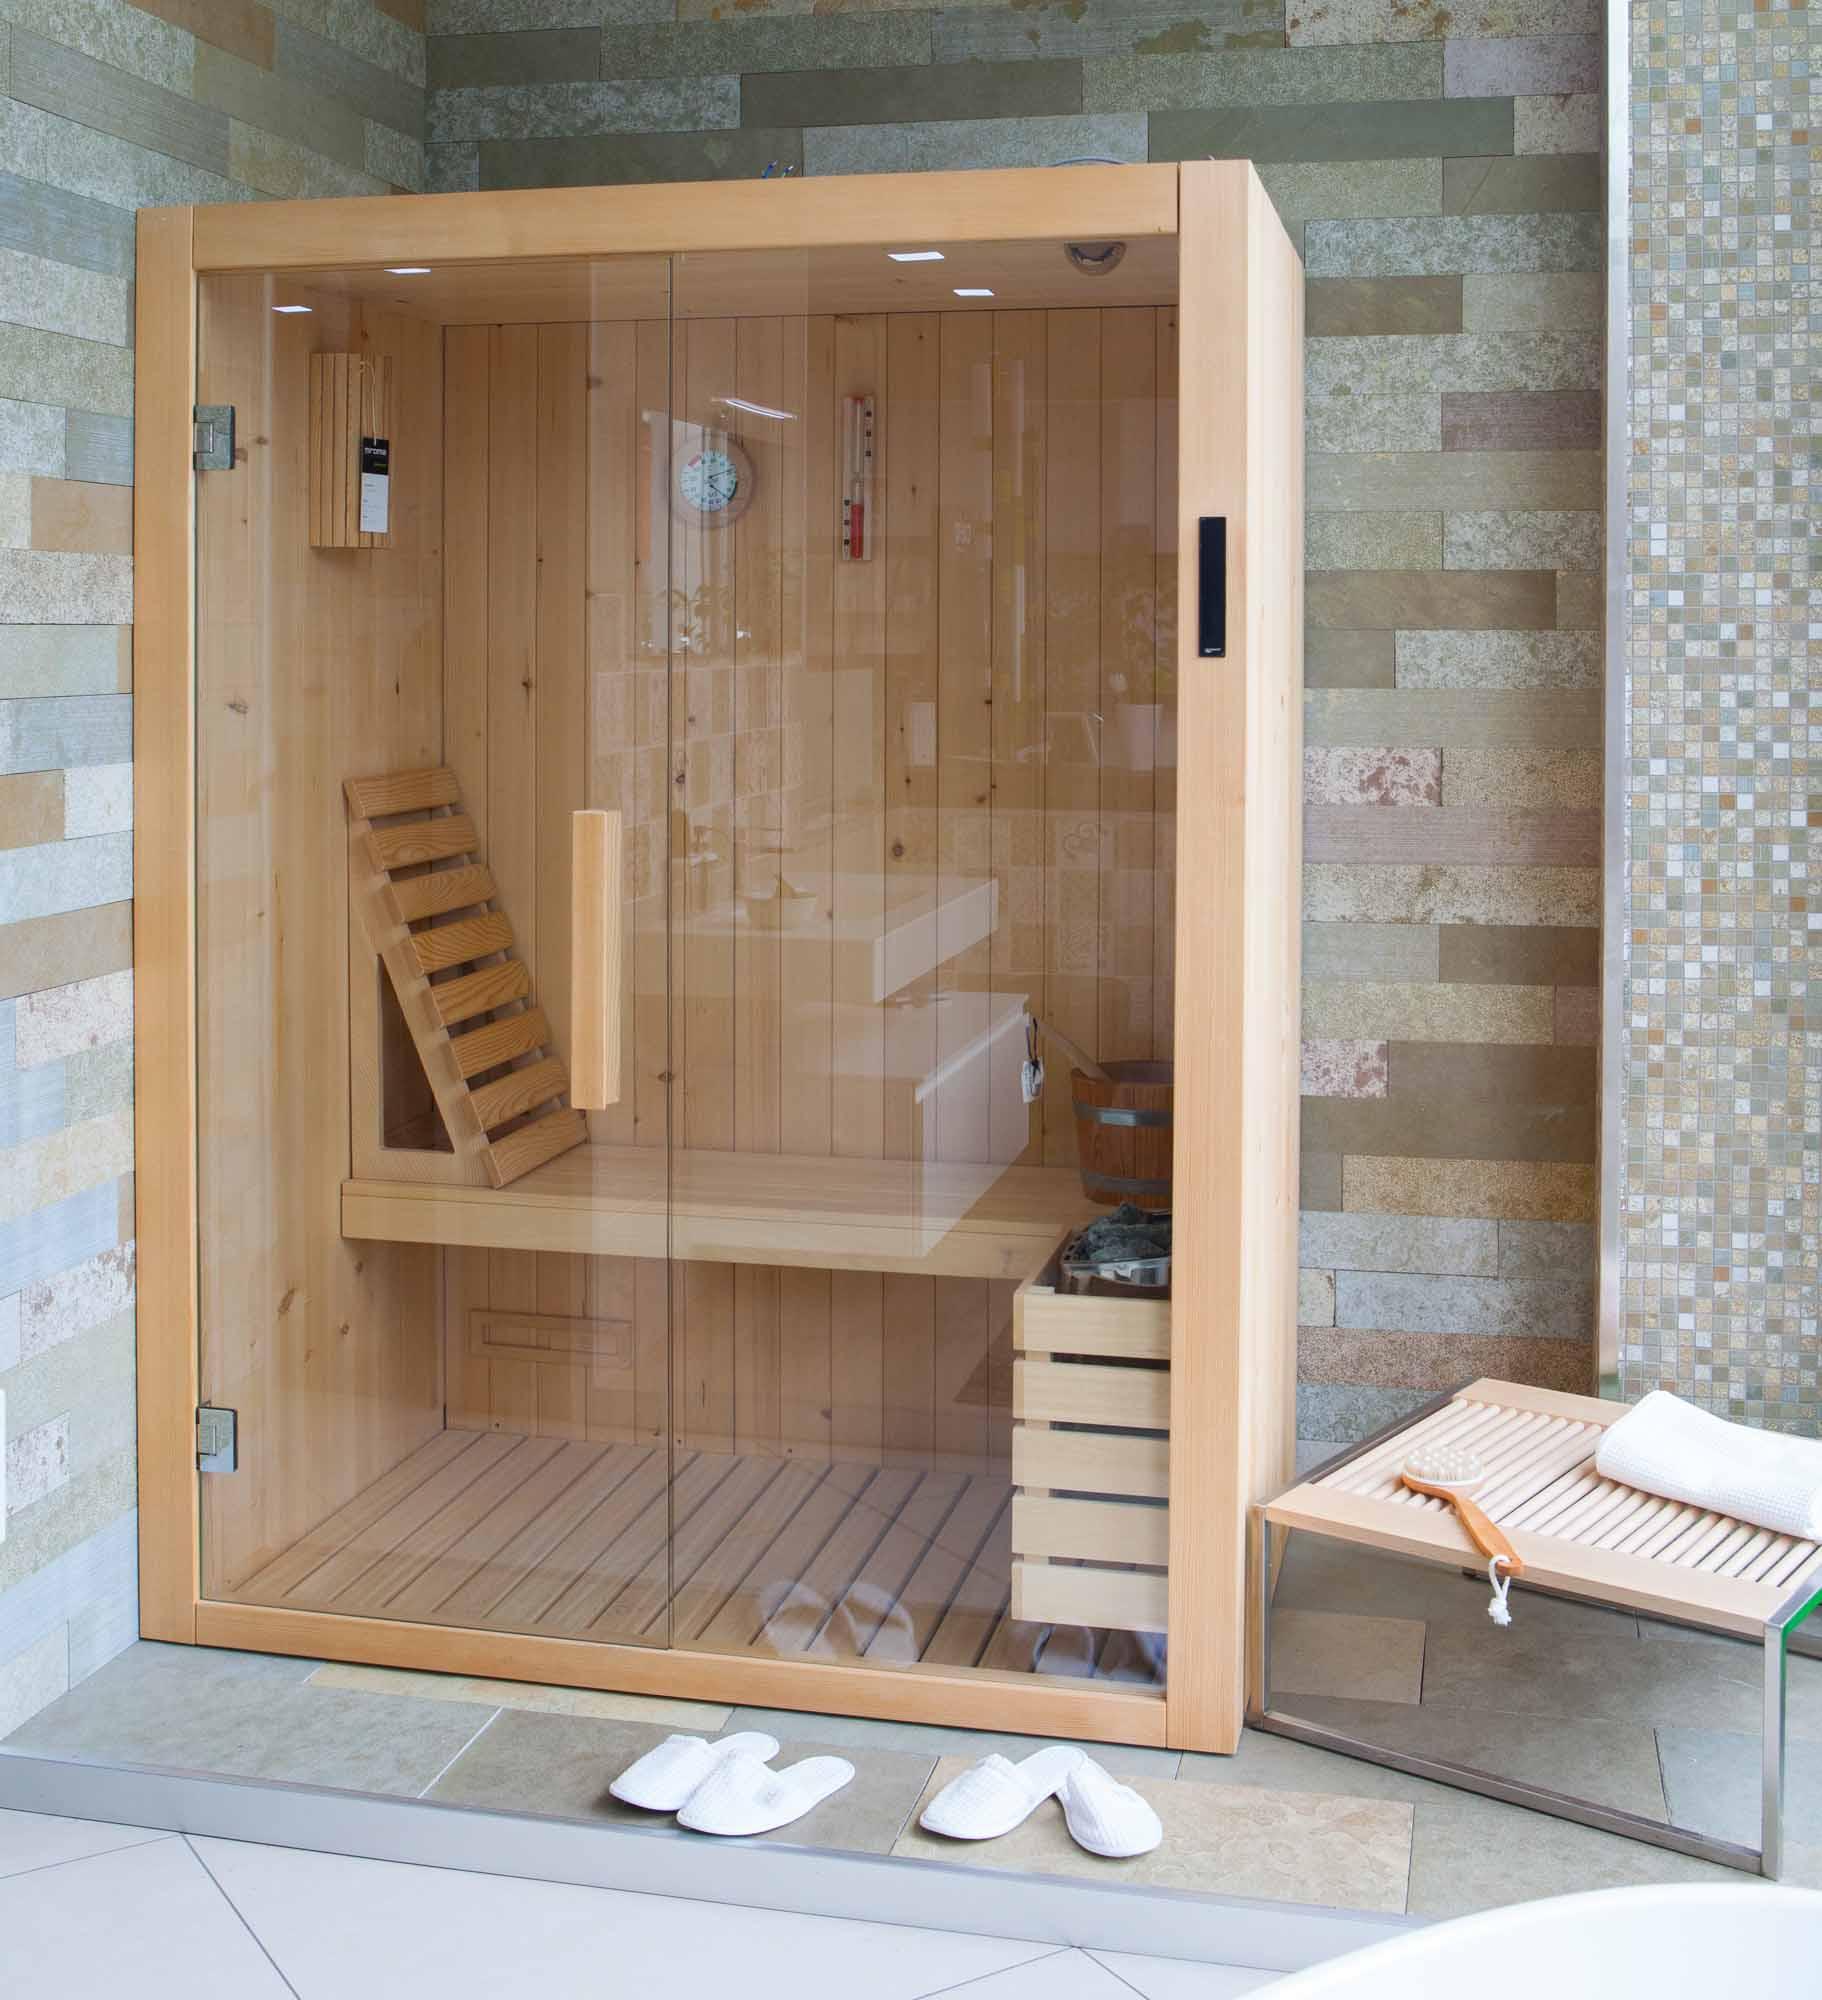 Costo sauna per casa top immagine grande prodotto with costo sauna per casa best sauna a raggi - Prezzi sauna per casa ...